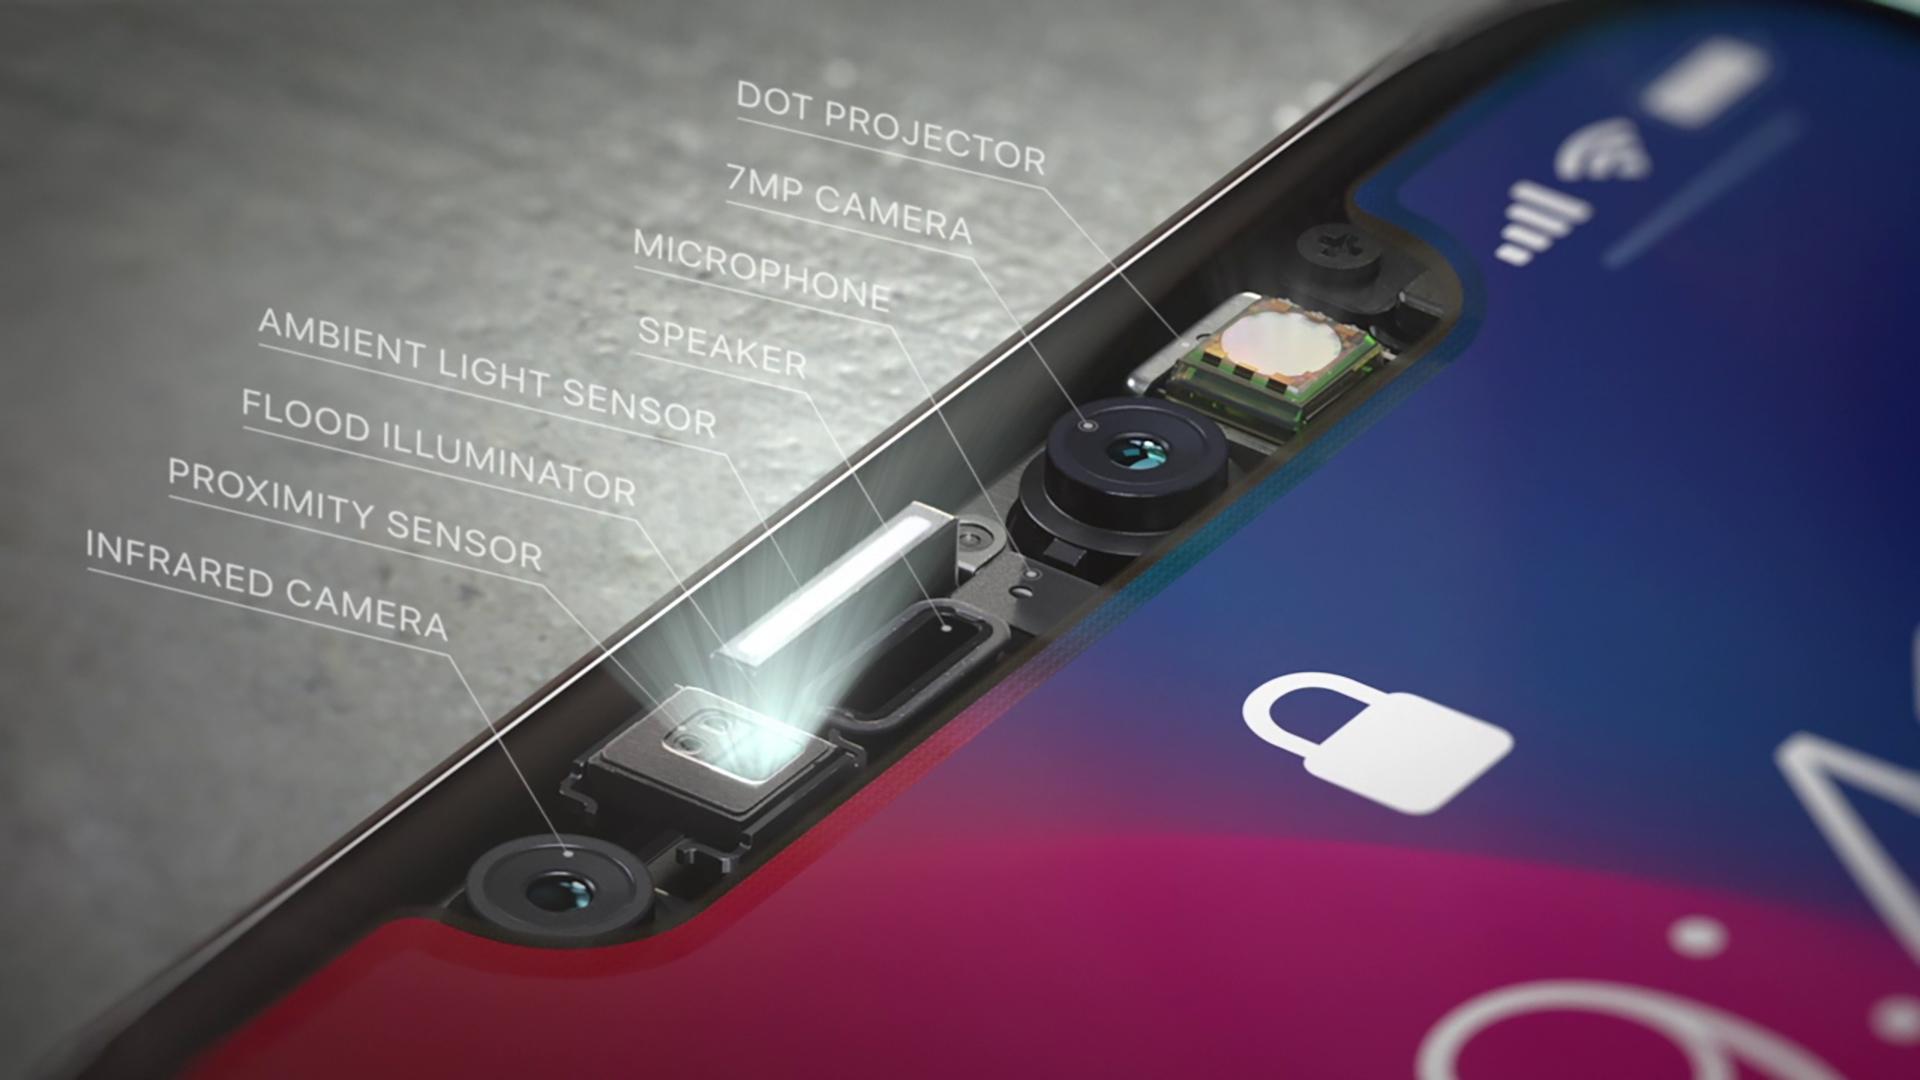 Vein ID als Ergänzung zu Face ID? iPhone soll Gesichts-Venen scannen